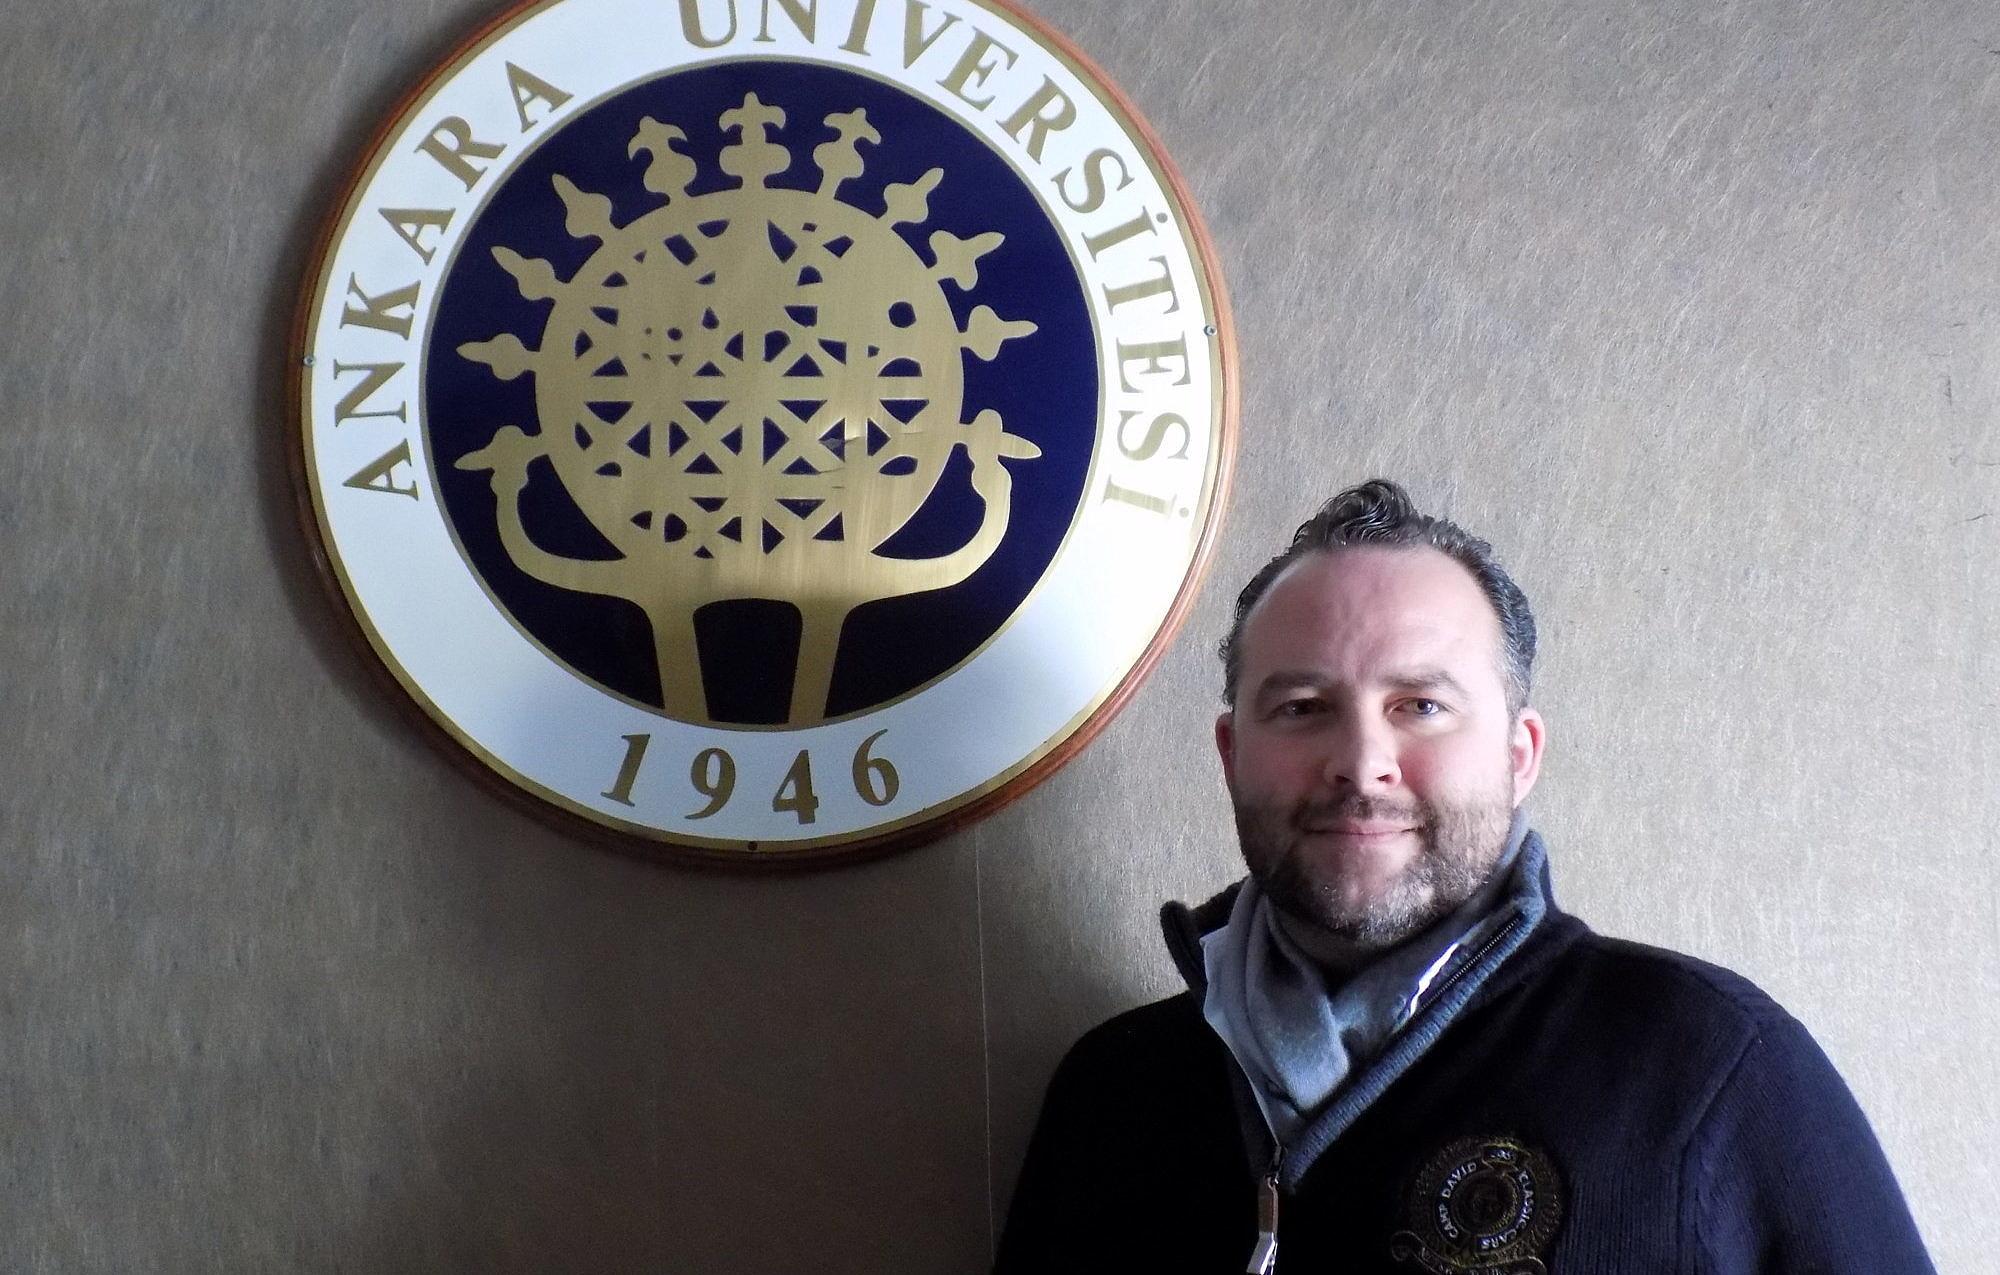 Dr Alexander Niedermeier Lehrt Als Gastdozent An Den Universitäten